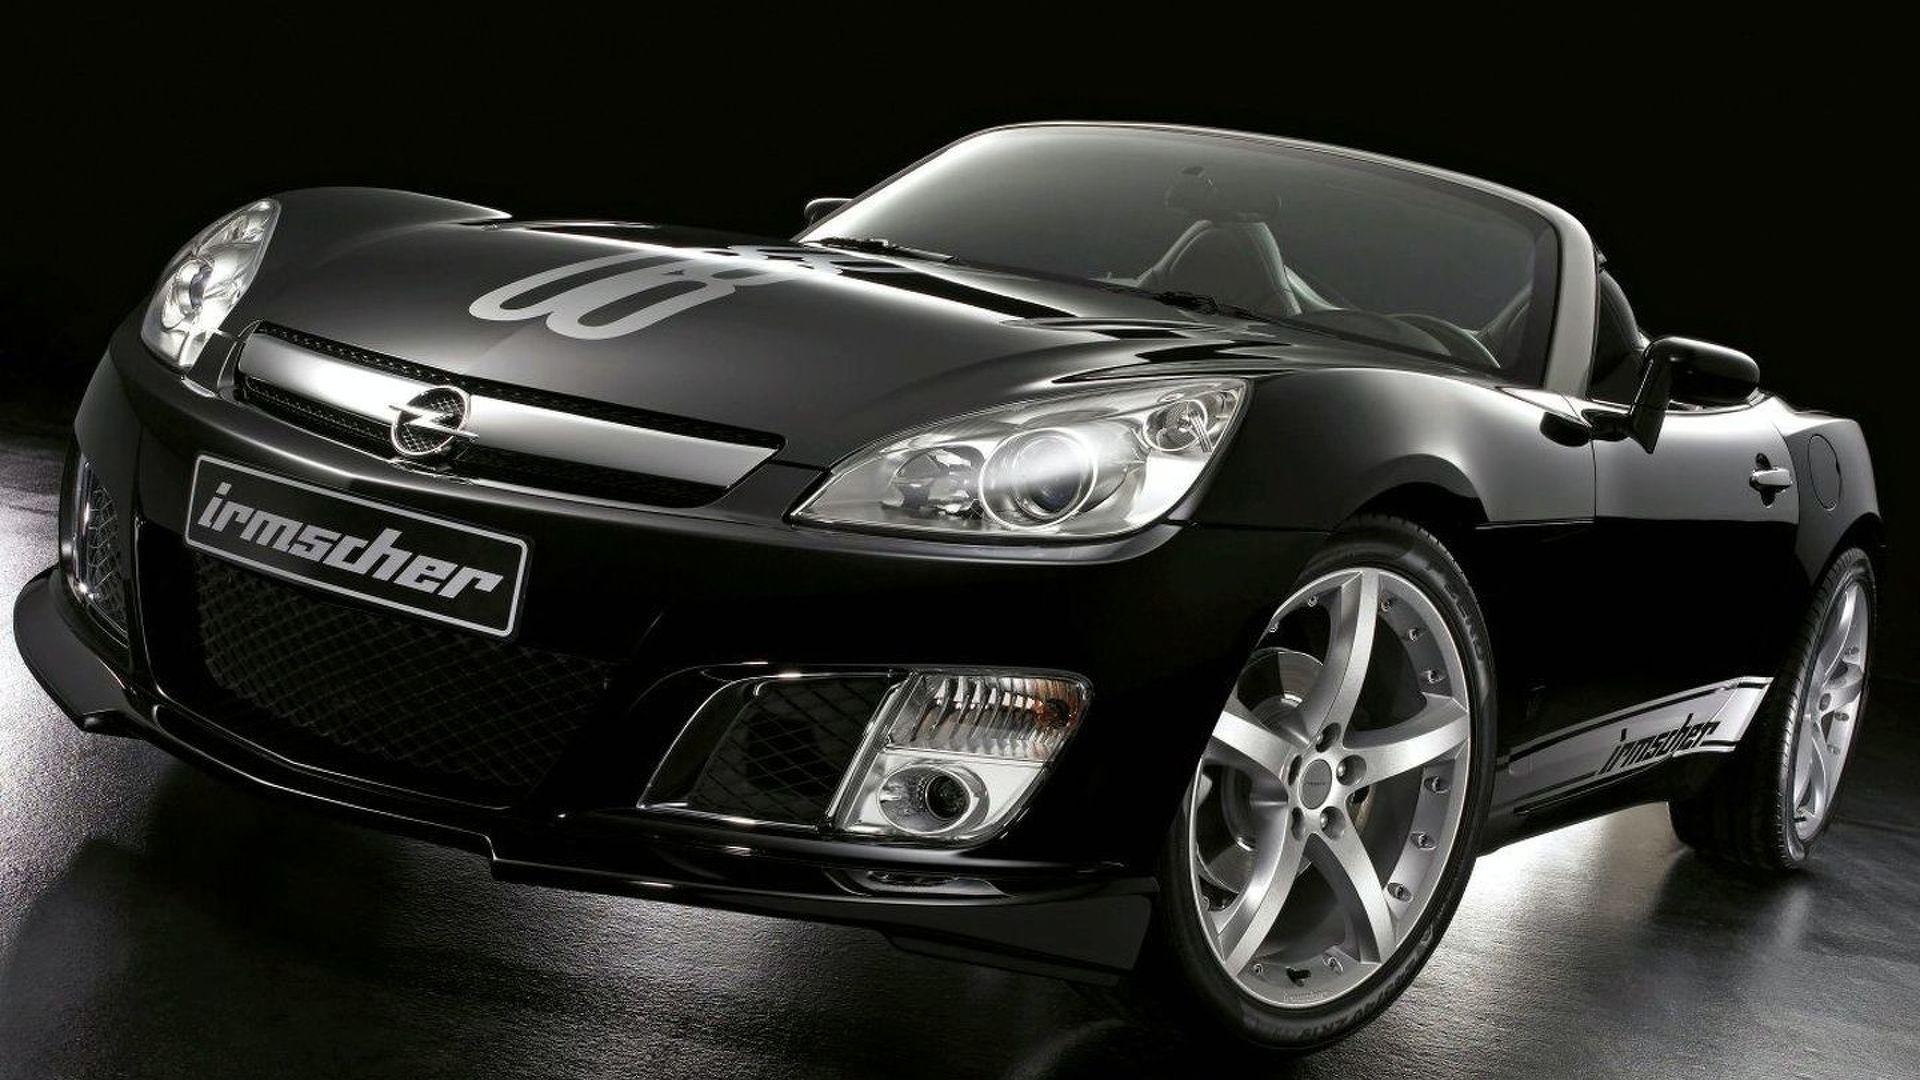 Irmscher V8 Powered GT i40 Revealed